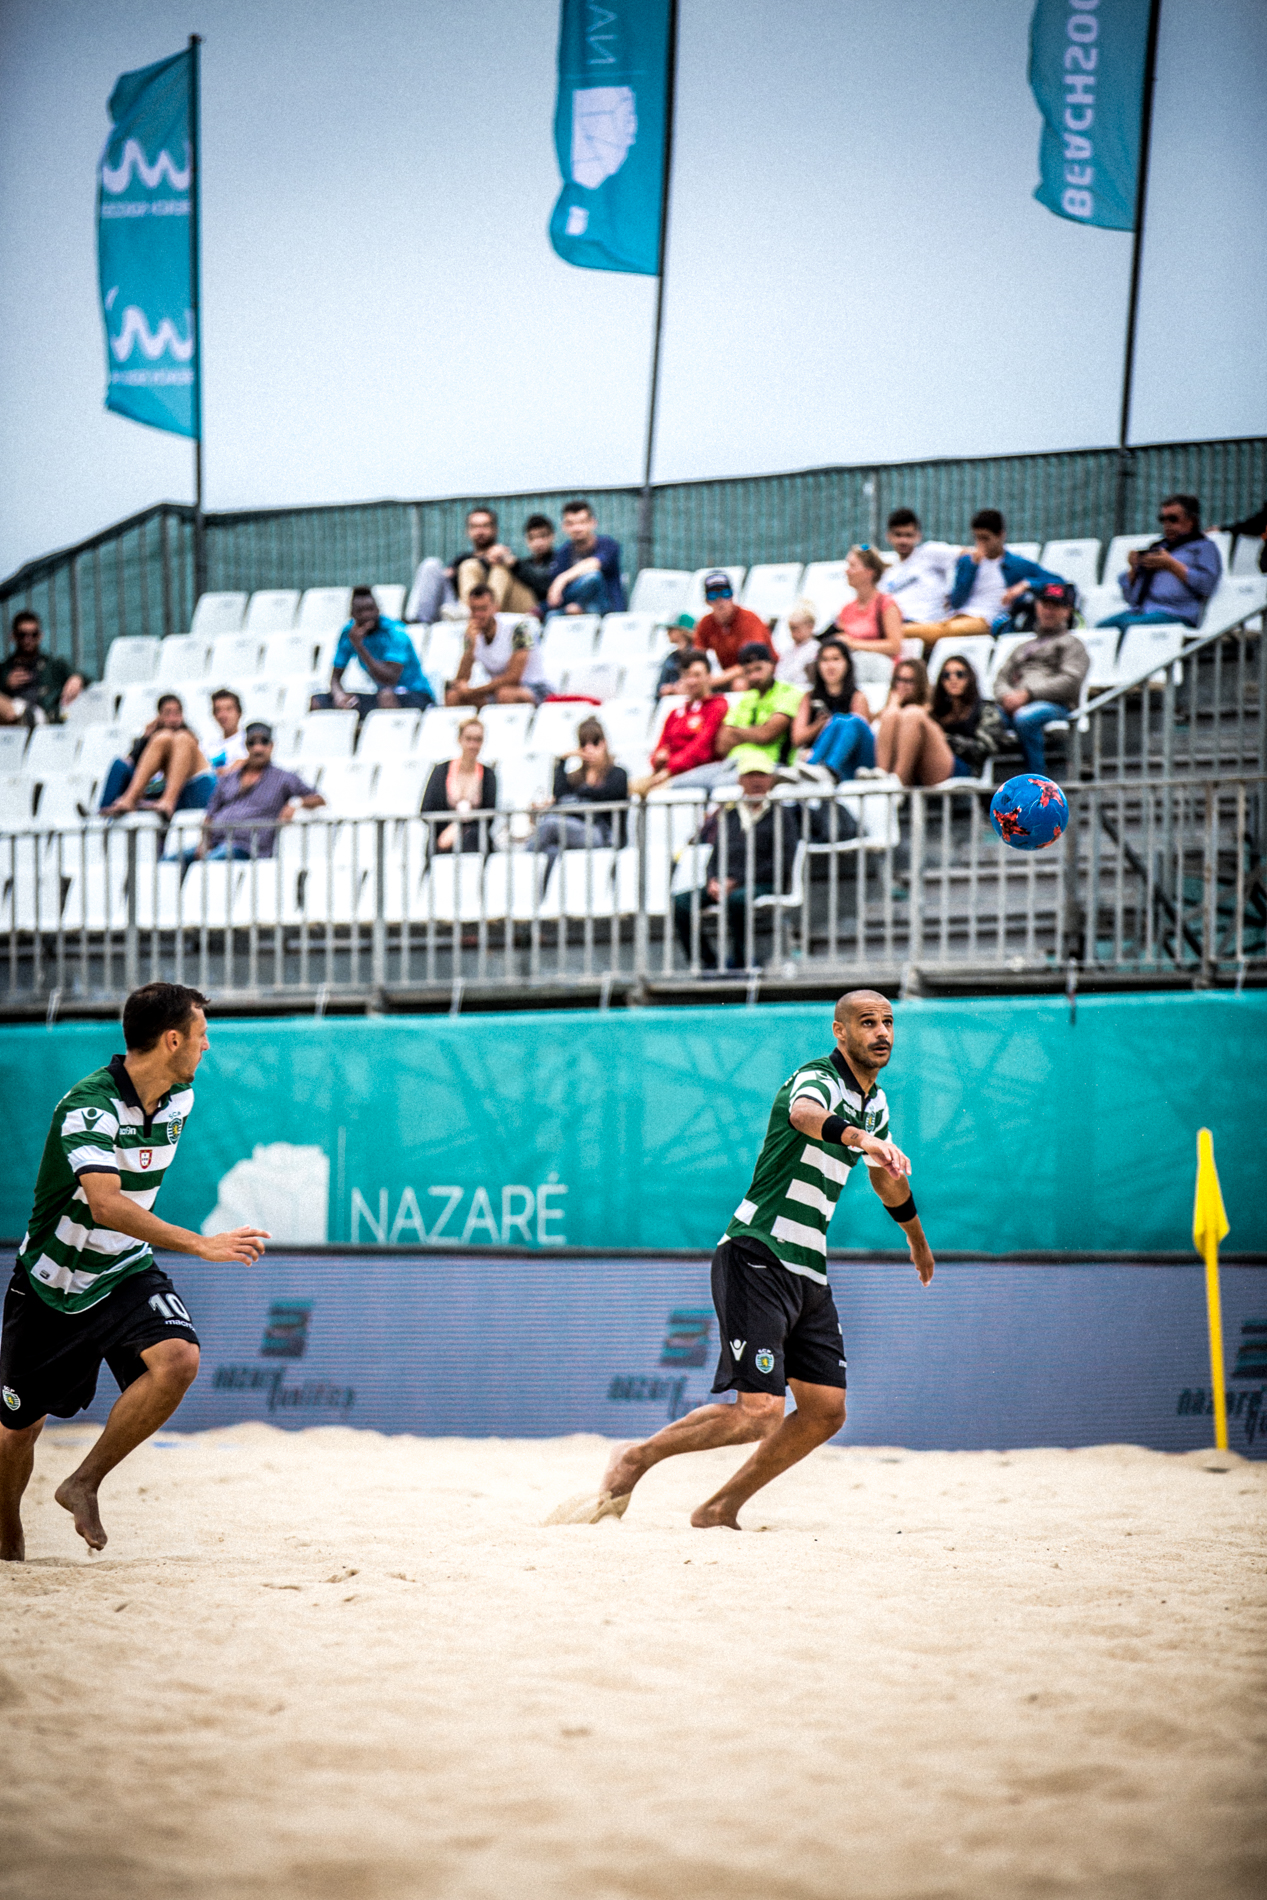 Euro Winners Cup - FIFA beach soccer Nazaré 2017 documented by ROMAIN STAROS at THOMAS TREUHAFT0 (9)